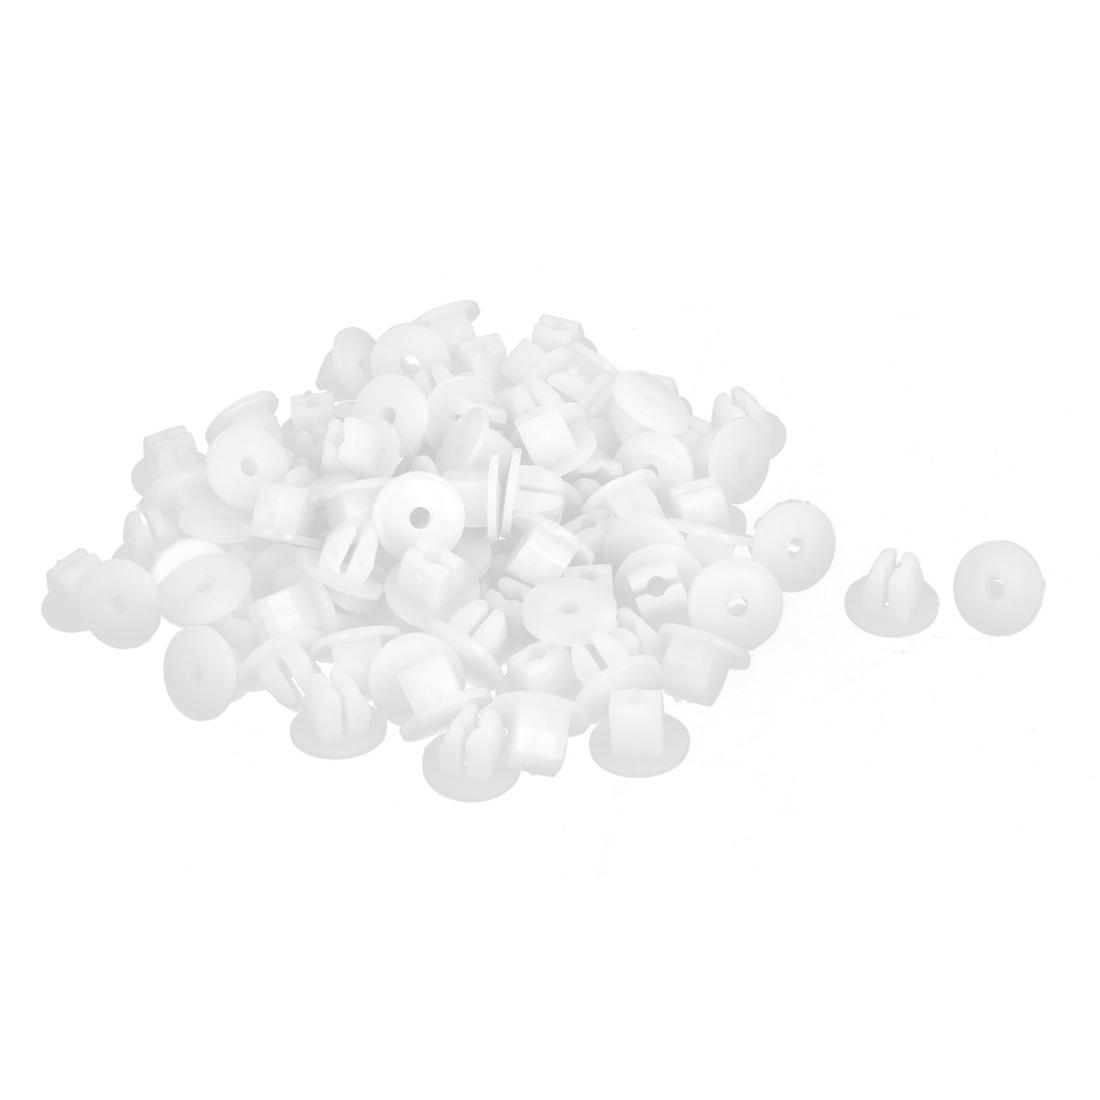 100 Pcs White Plastic Rivet Fastener Mud Flaps Bumper Fender Clips 8mm x 16mm x 26mm